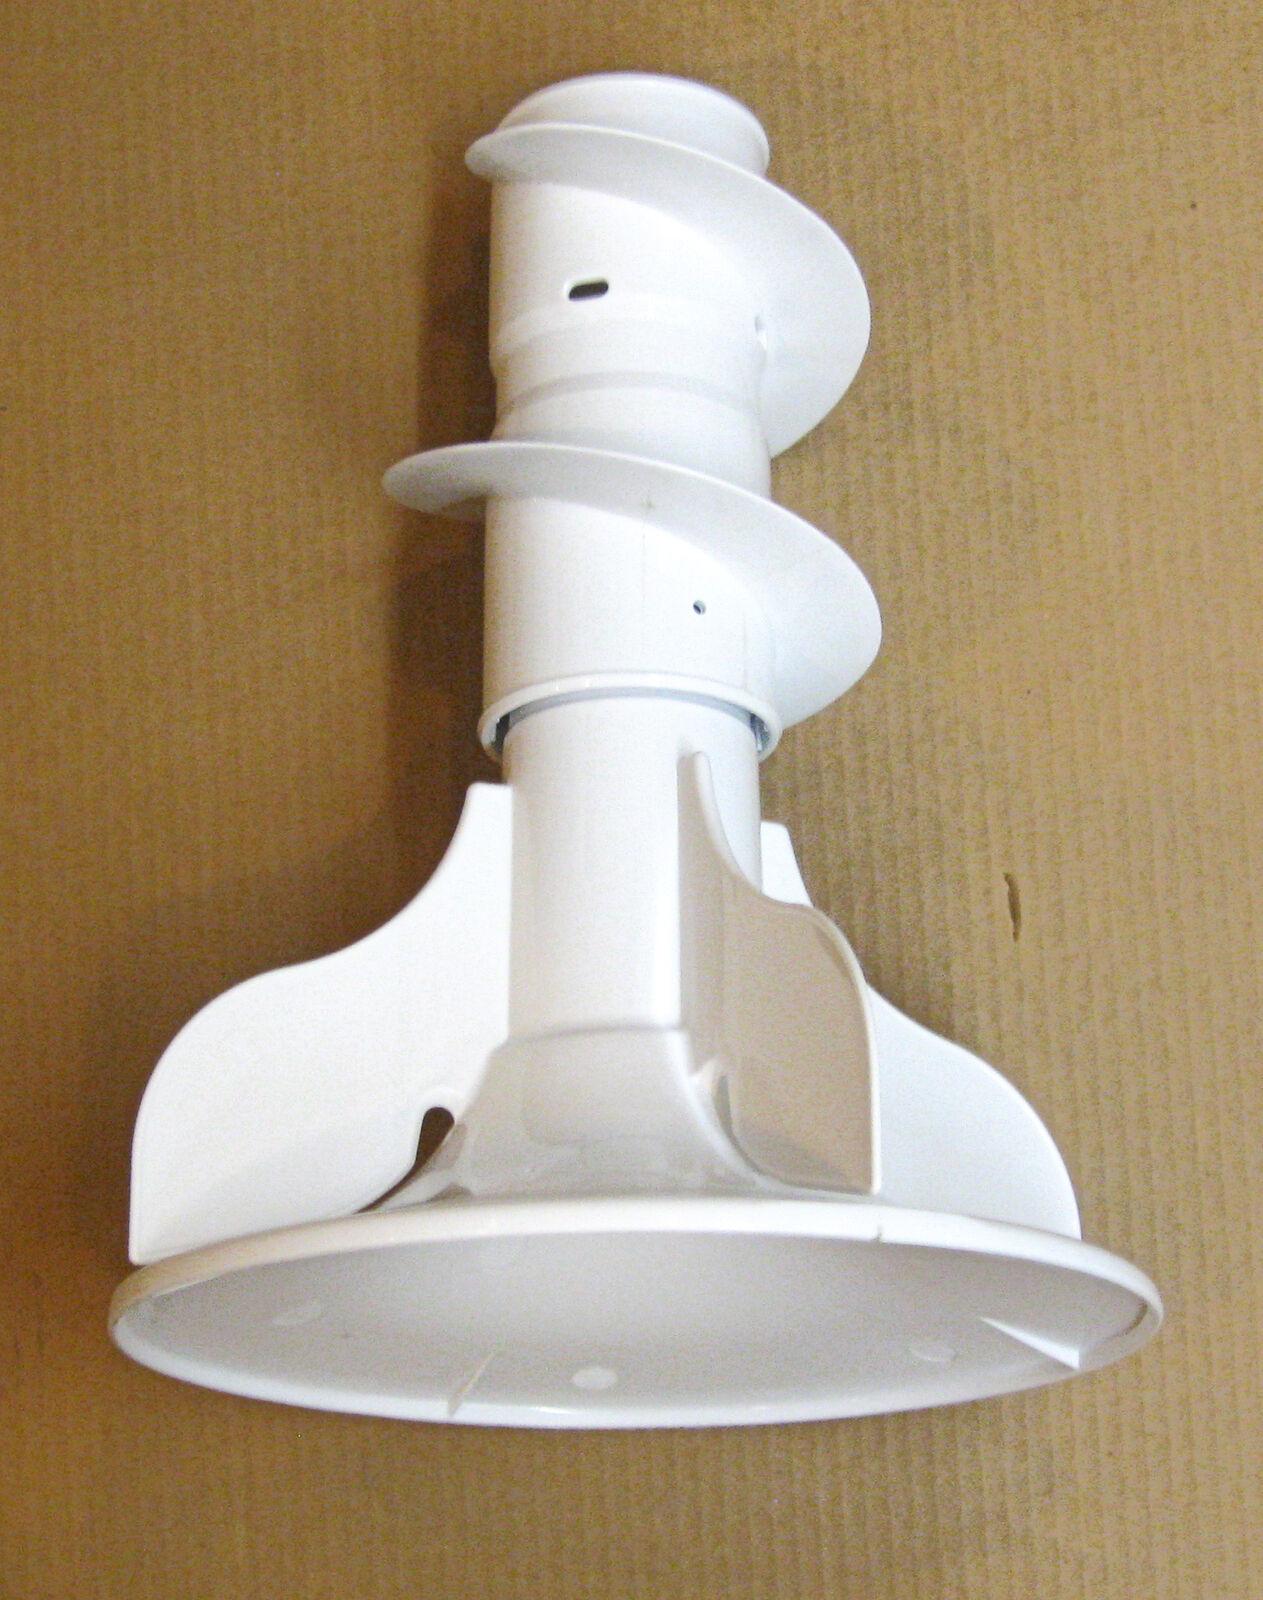 WH43X25442 GE General Electric Washer Machine Agitator AP6004866 PS11736866